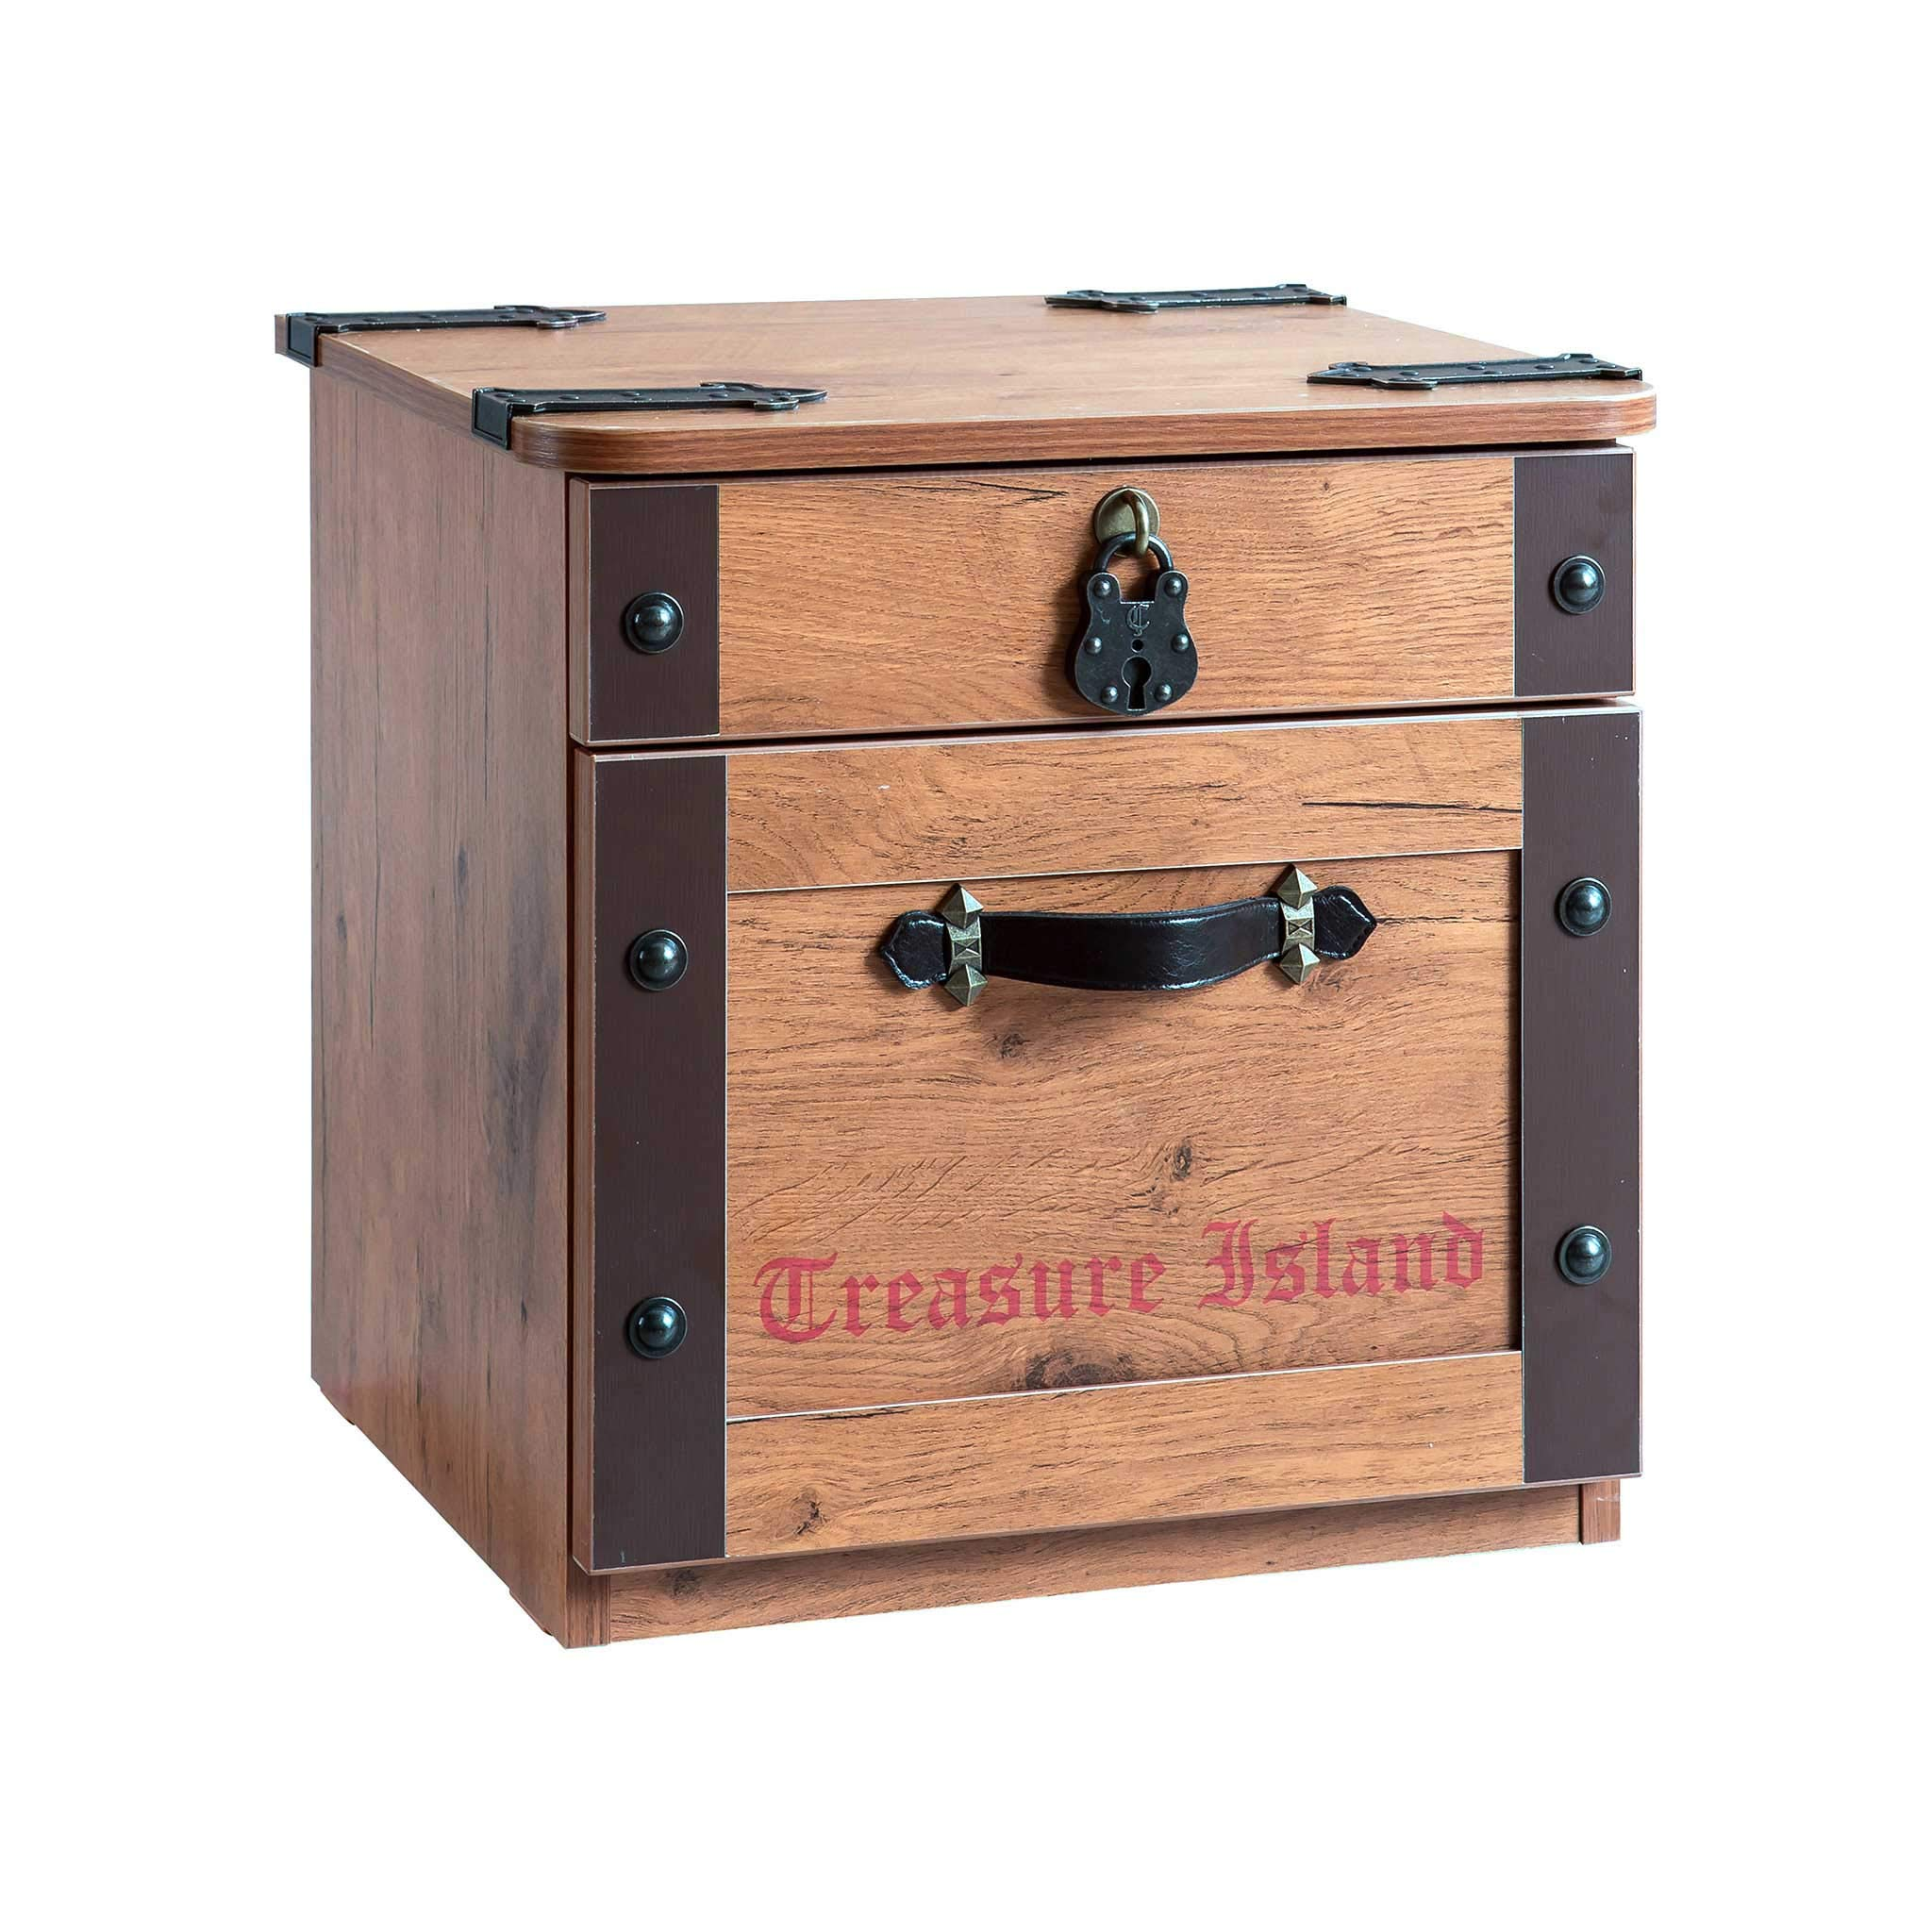 Cilek Pirate Nightstand Side Table Childrens Nightstand Brown